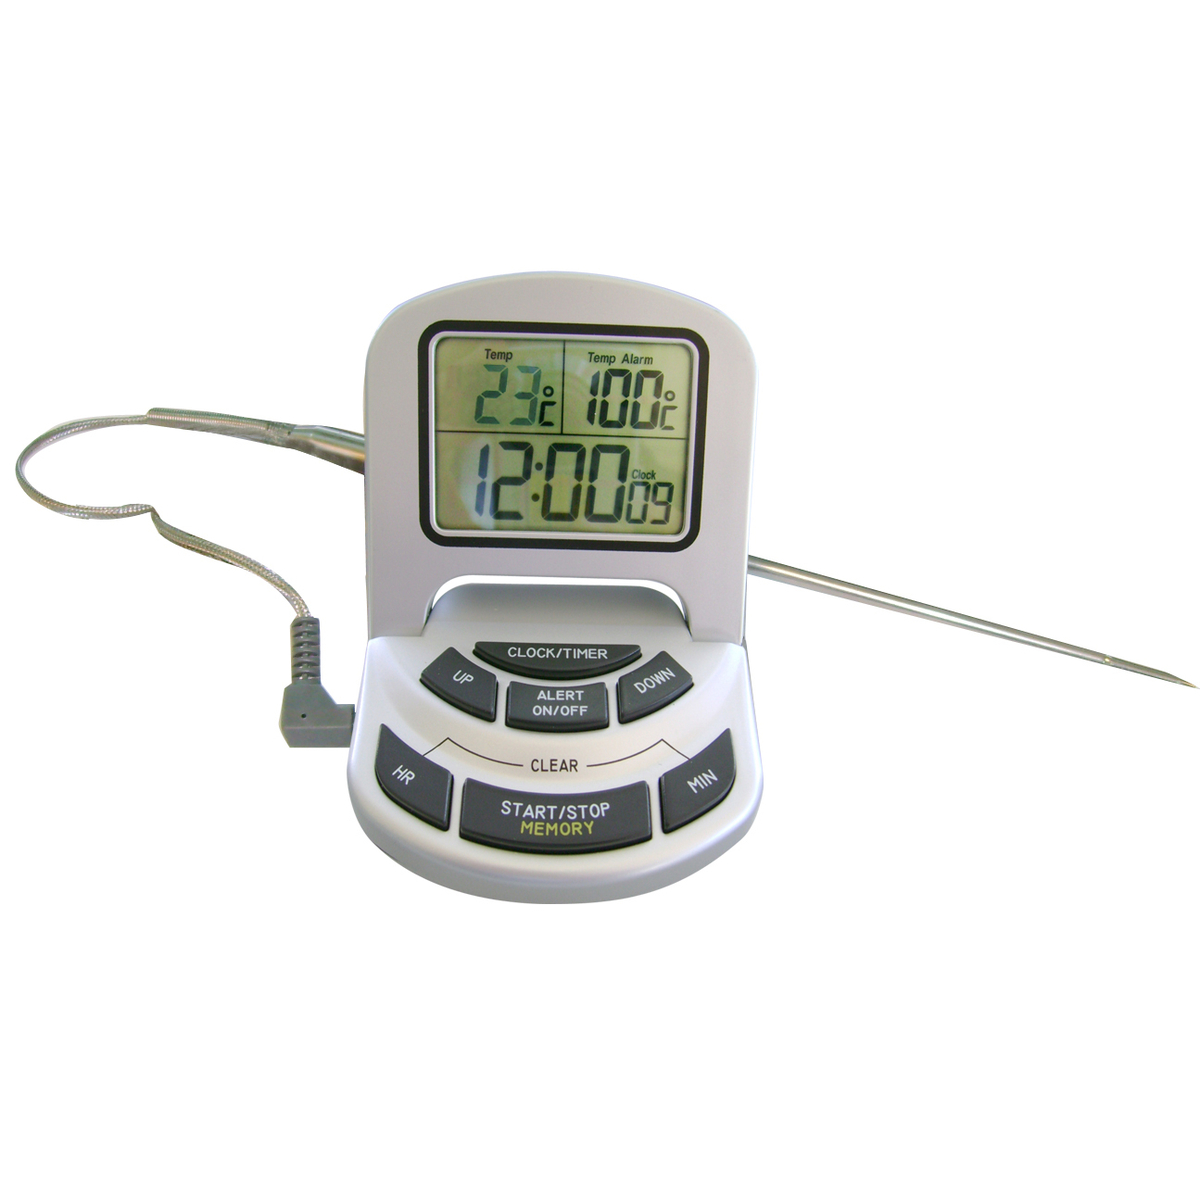 Thermomètre digital spécial four cuisson +/-1°C Alla France